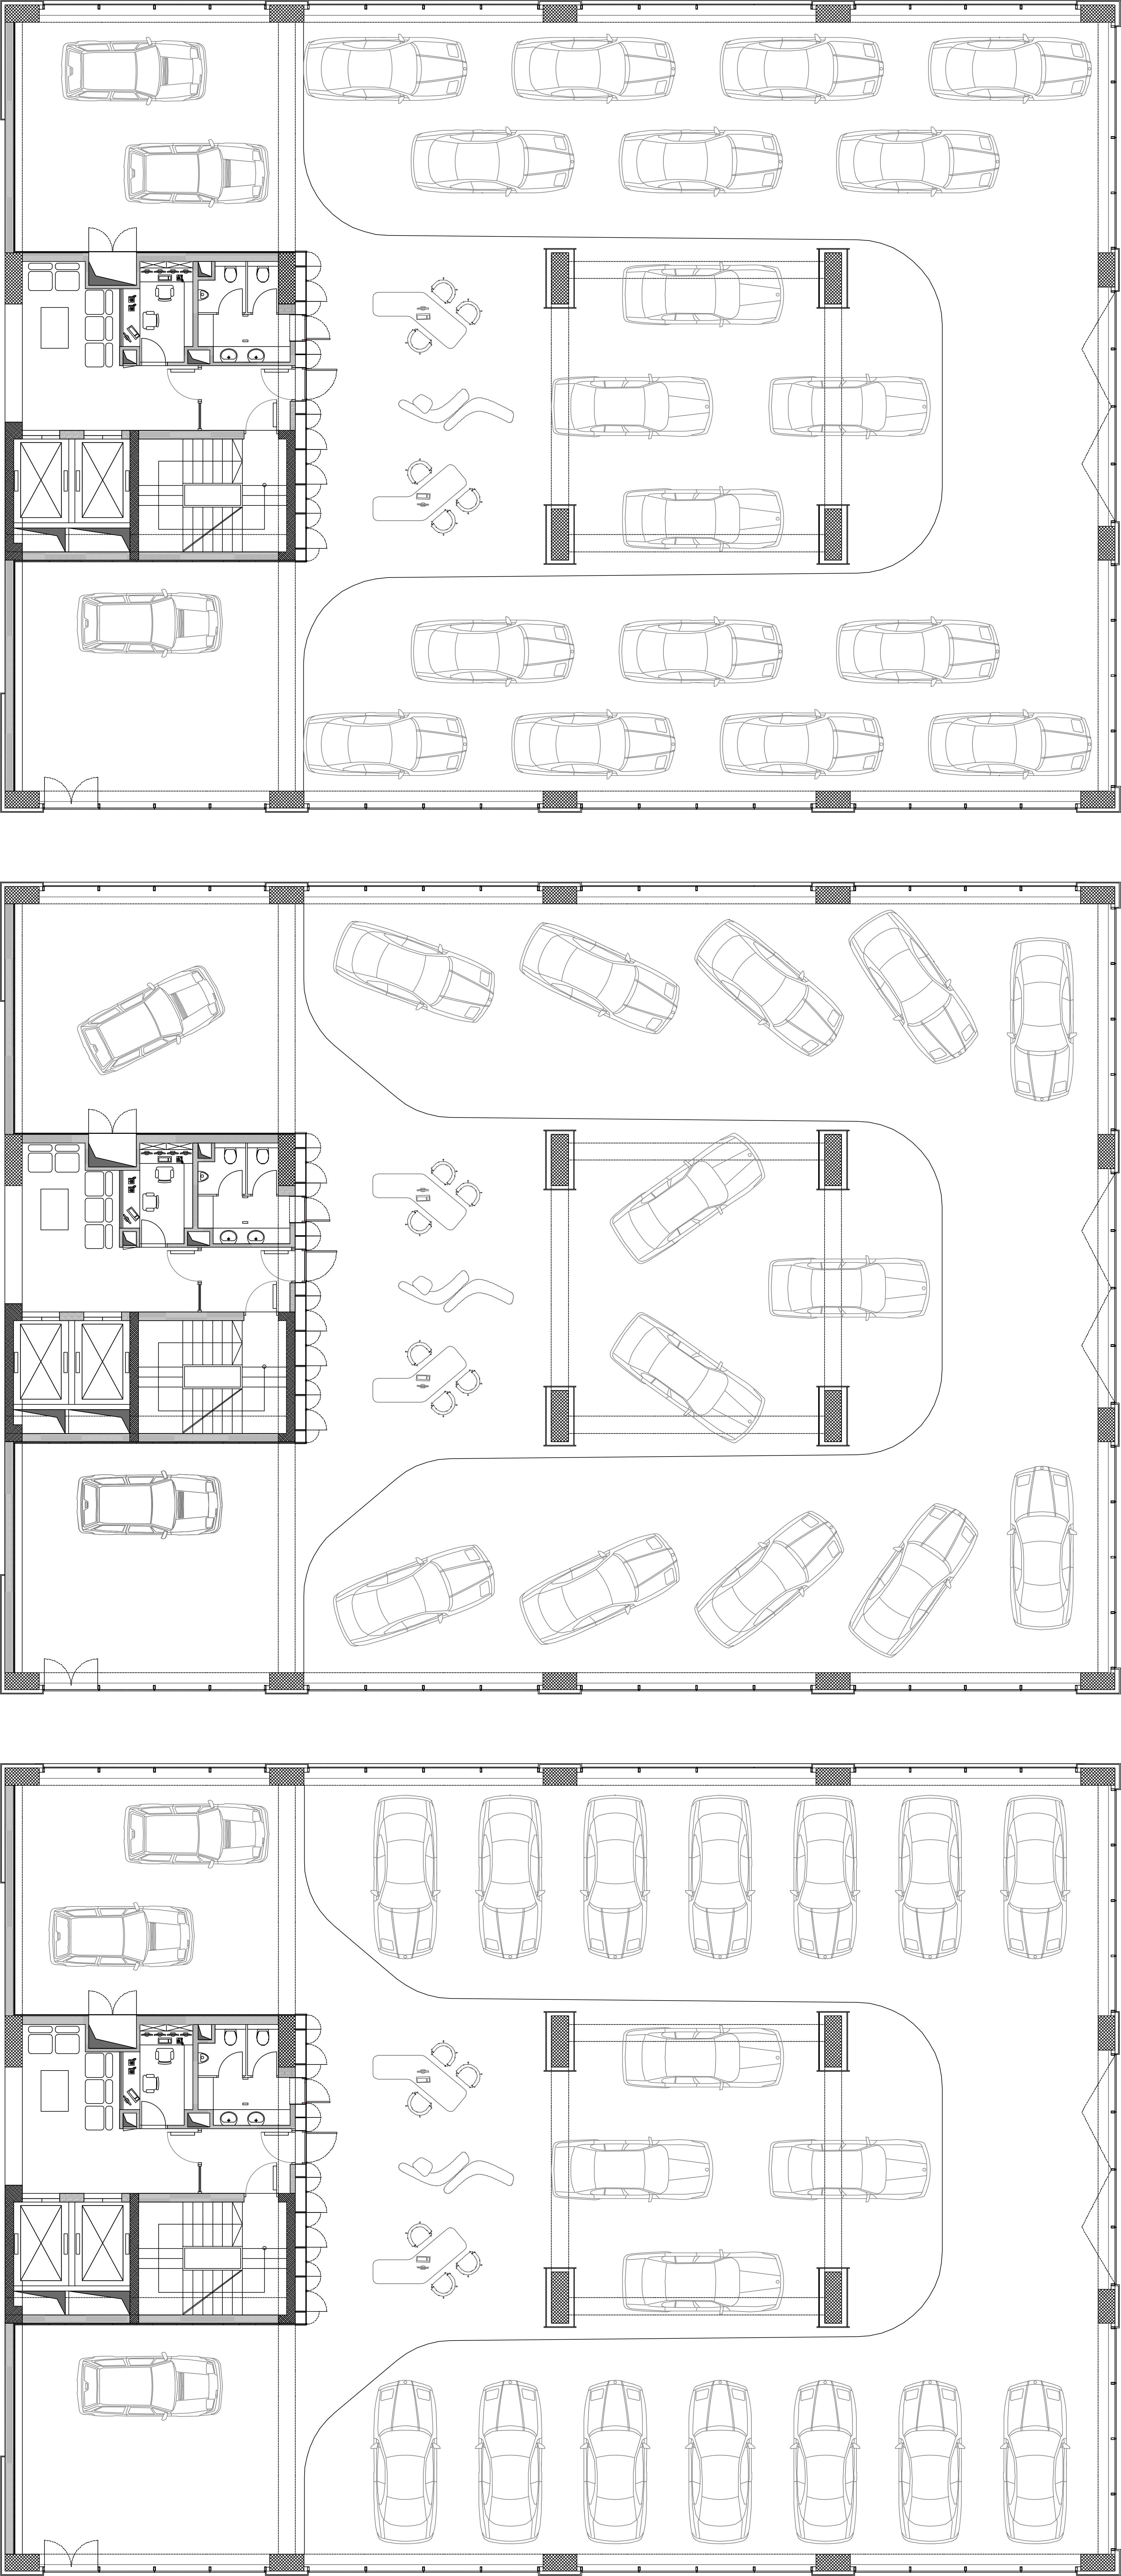 Car Showroom Interior Design Layout My Retail Design In 2020 Car Showroom Interior Showroom Interior Design Car Showroom